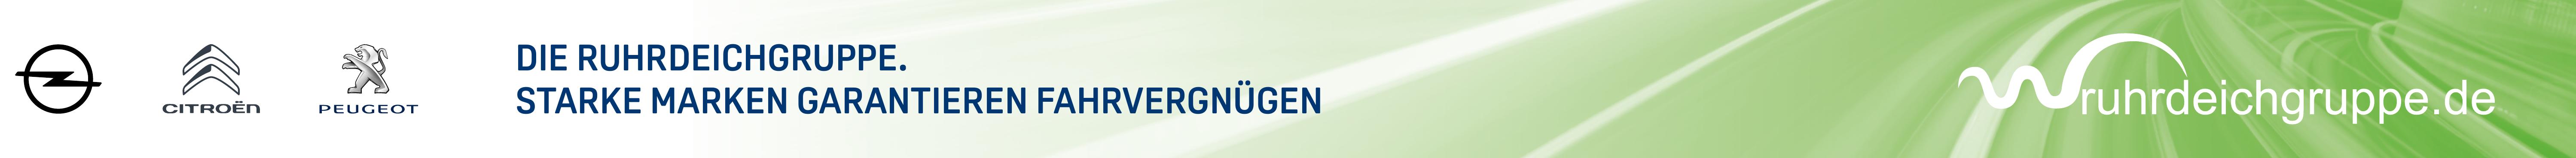 Ruhrdeichgruppe